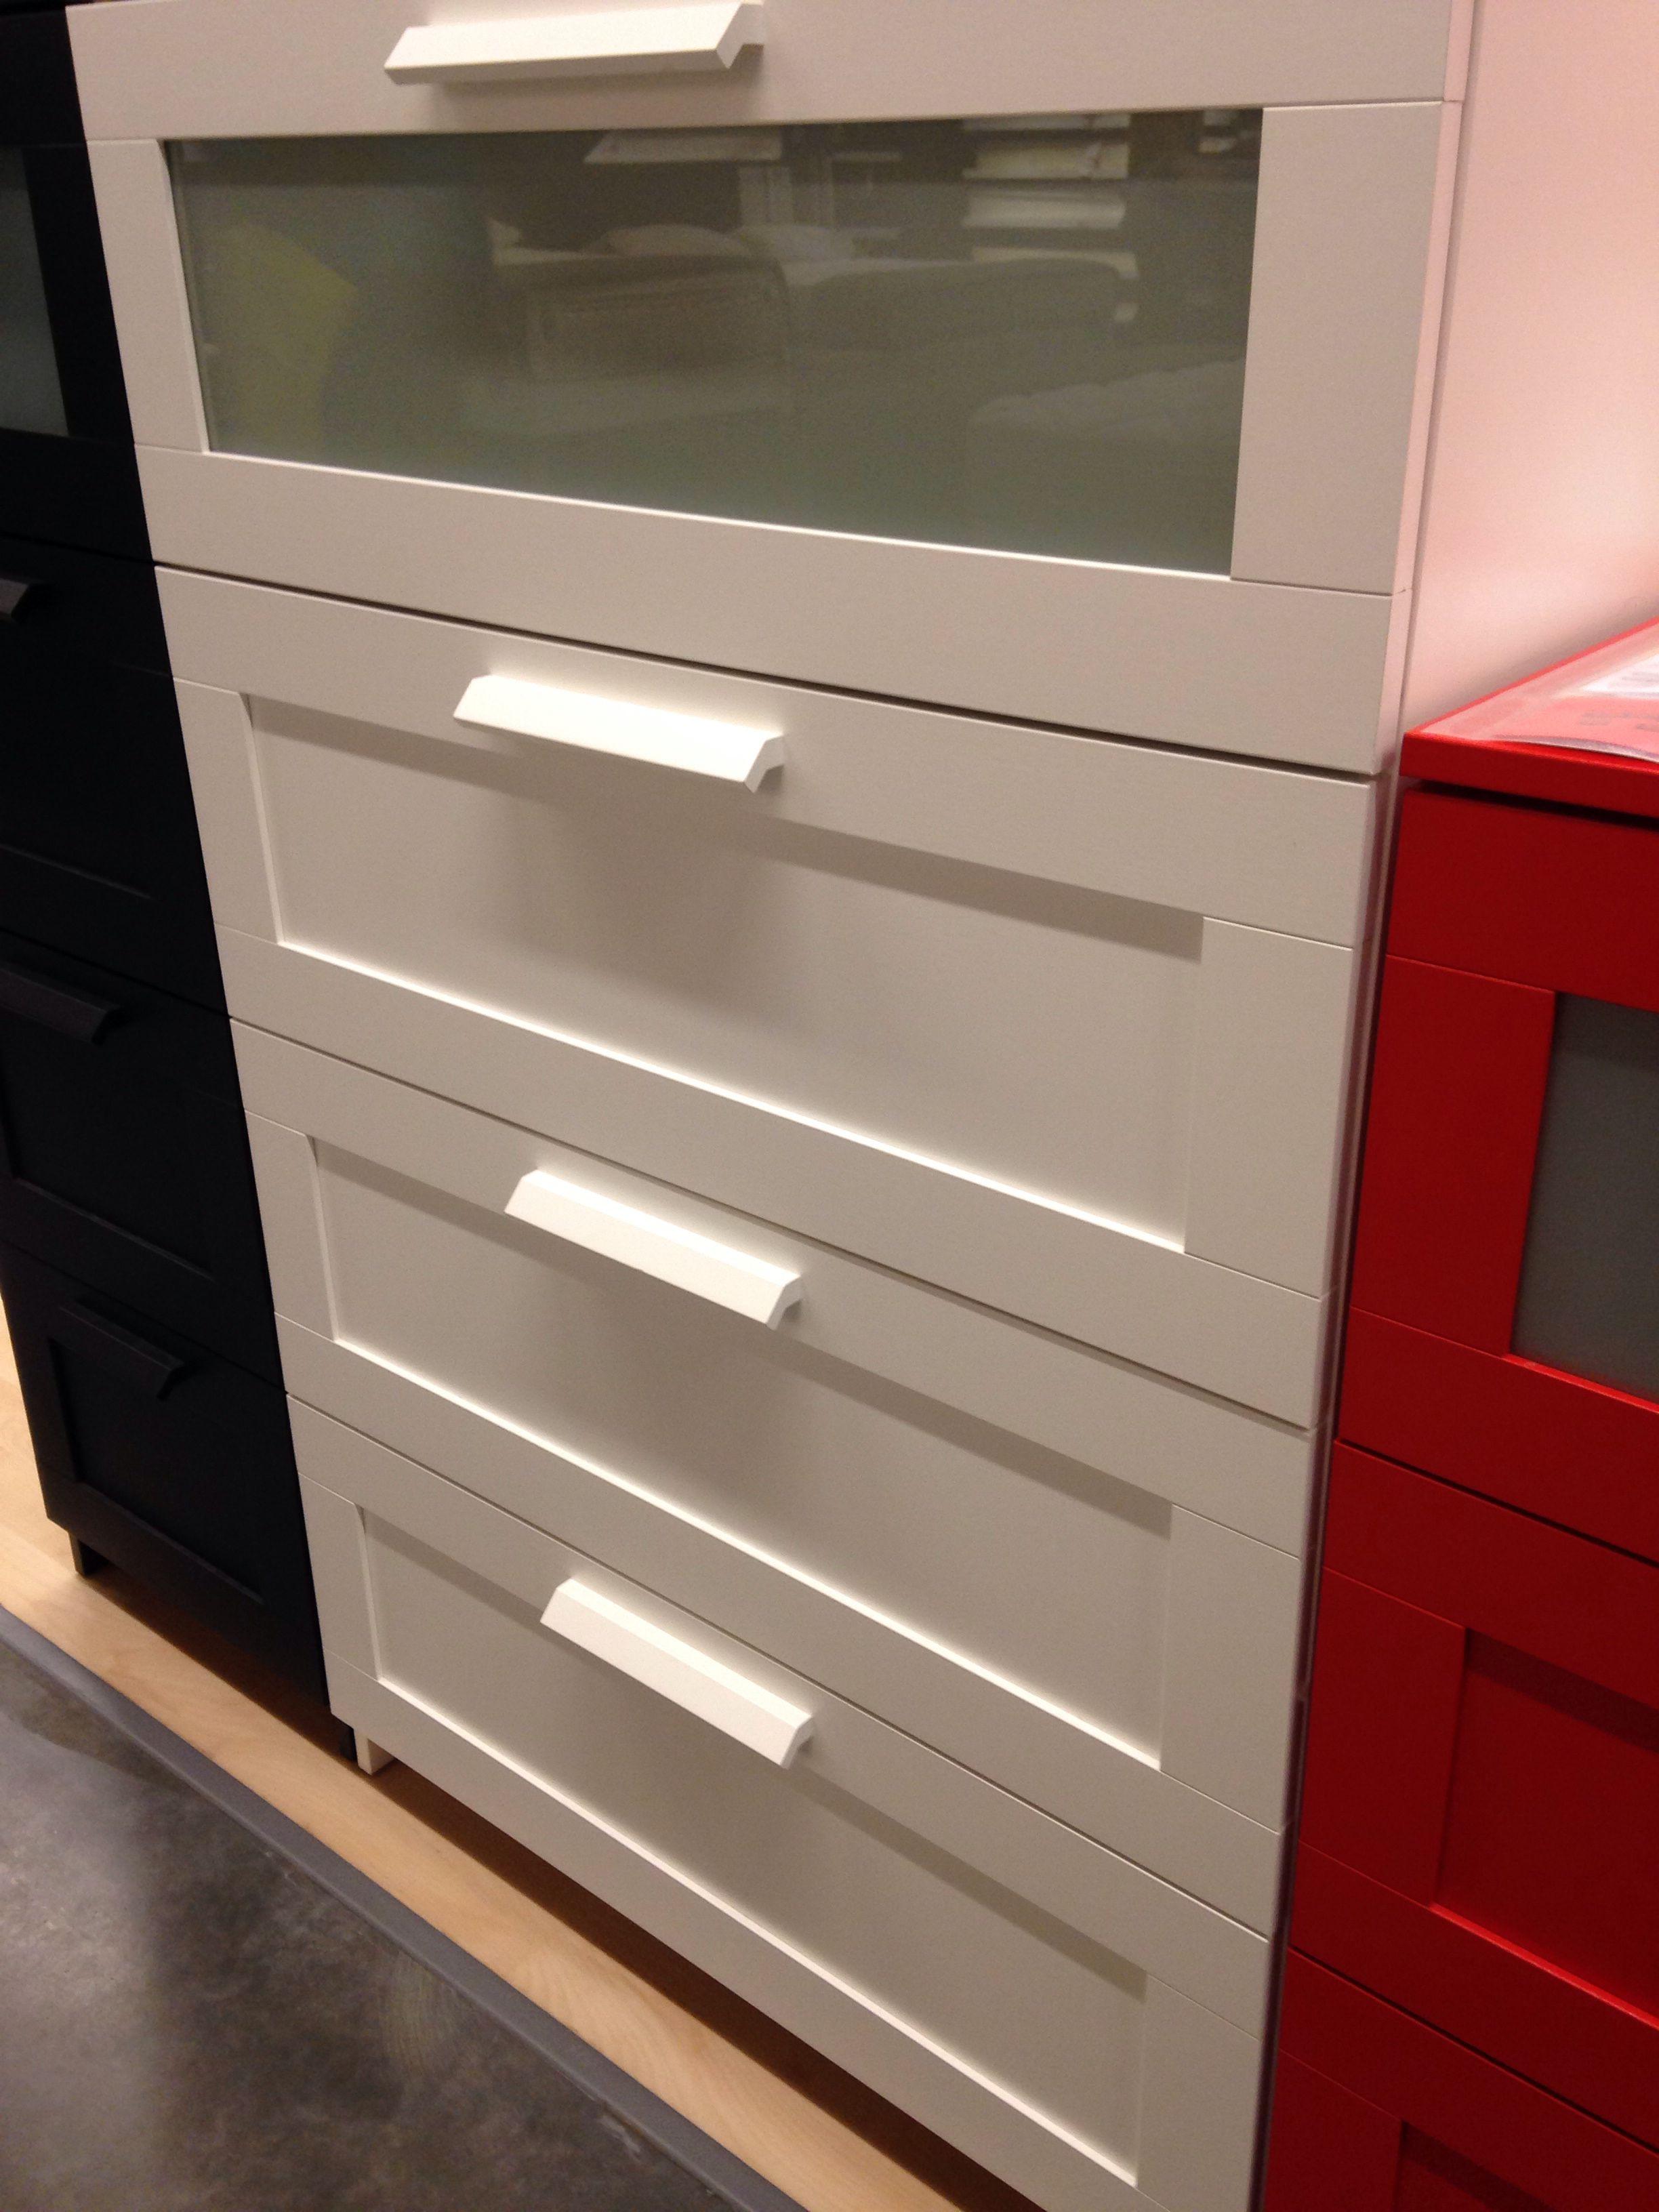 4 Drawer Dresser Brimnes $129